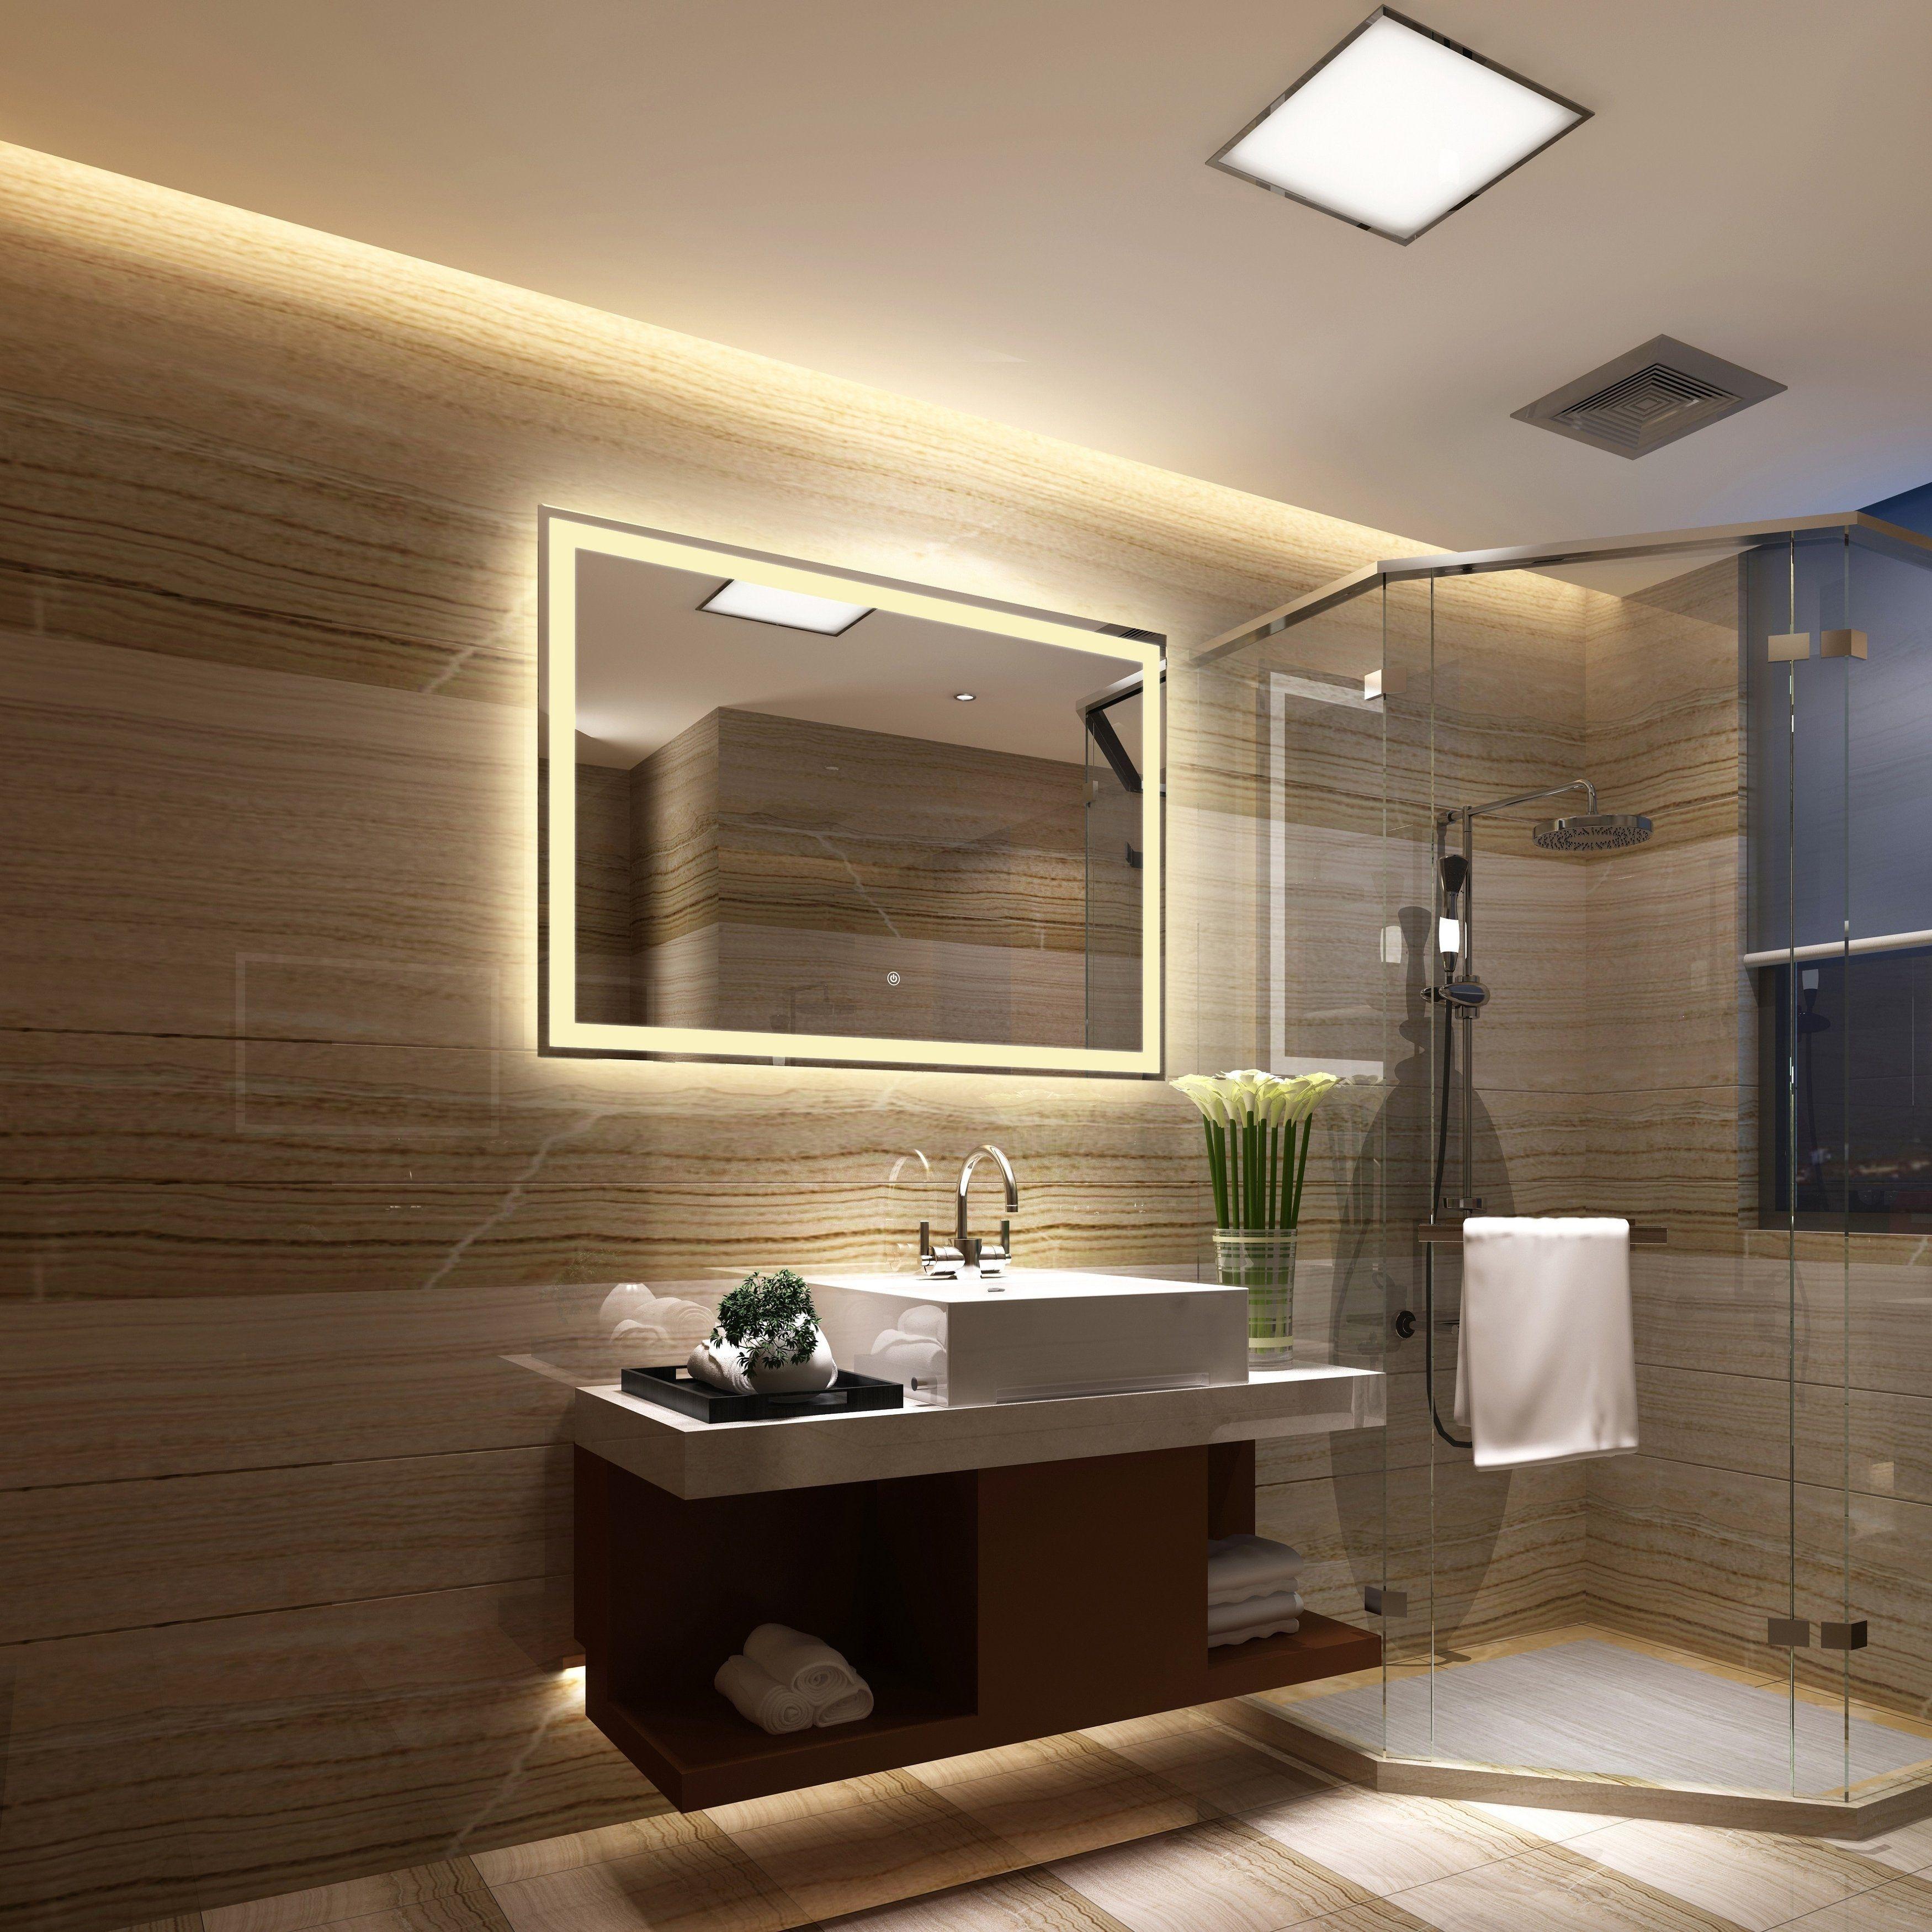 Frameless Wall Mounted Led Bathroom Mirror White Led Mirror Bathroom Bathroom Interior Design Bathroom Interior [ 3500 x 3500 Pixel ]